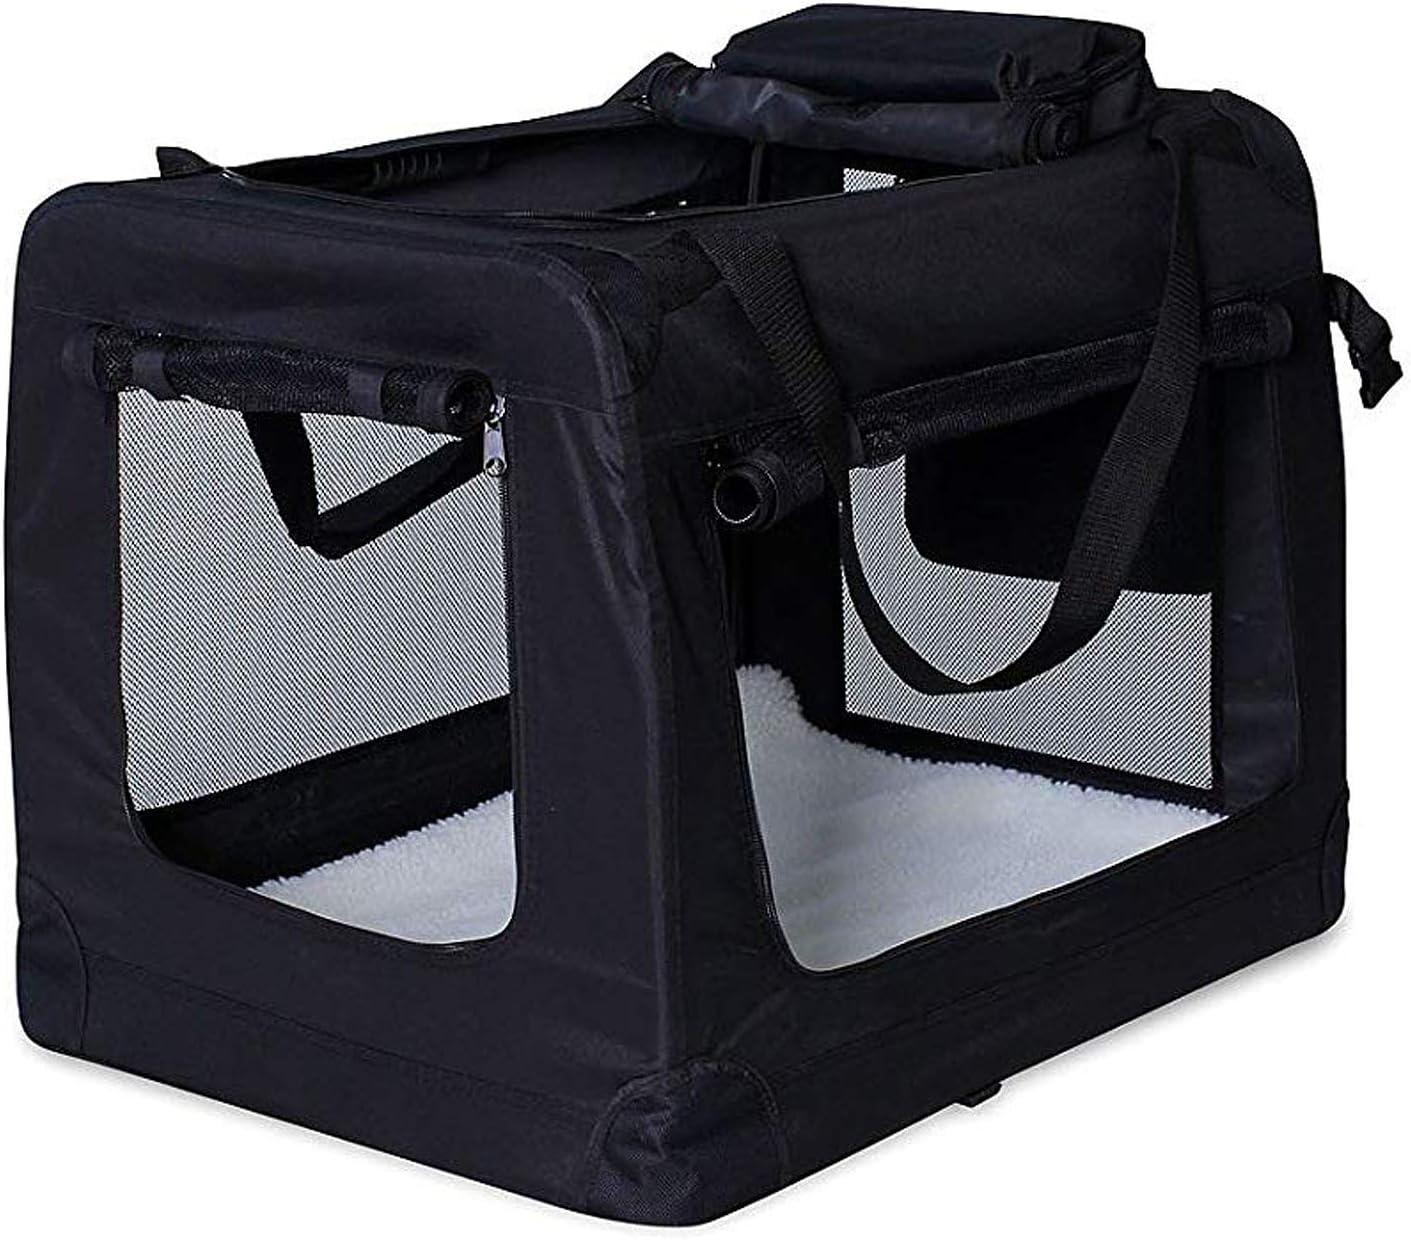 dibea TB10024 Bolsa de Transporte para Perros y Gatos Negro, 90x61x65 cm XXL